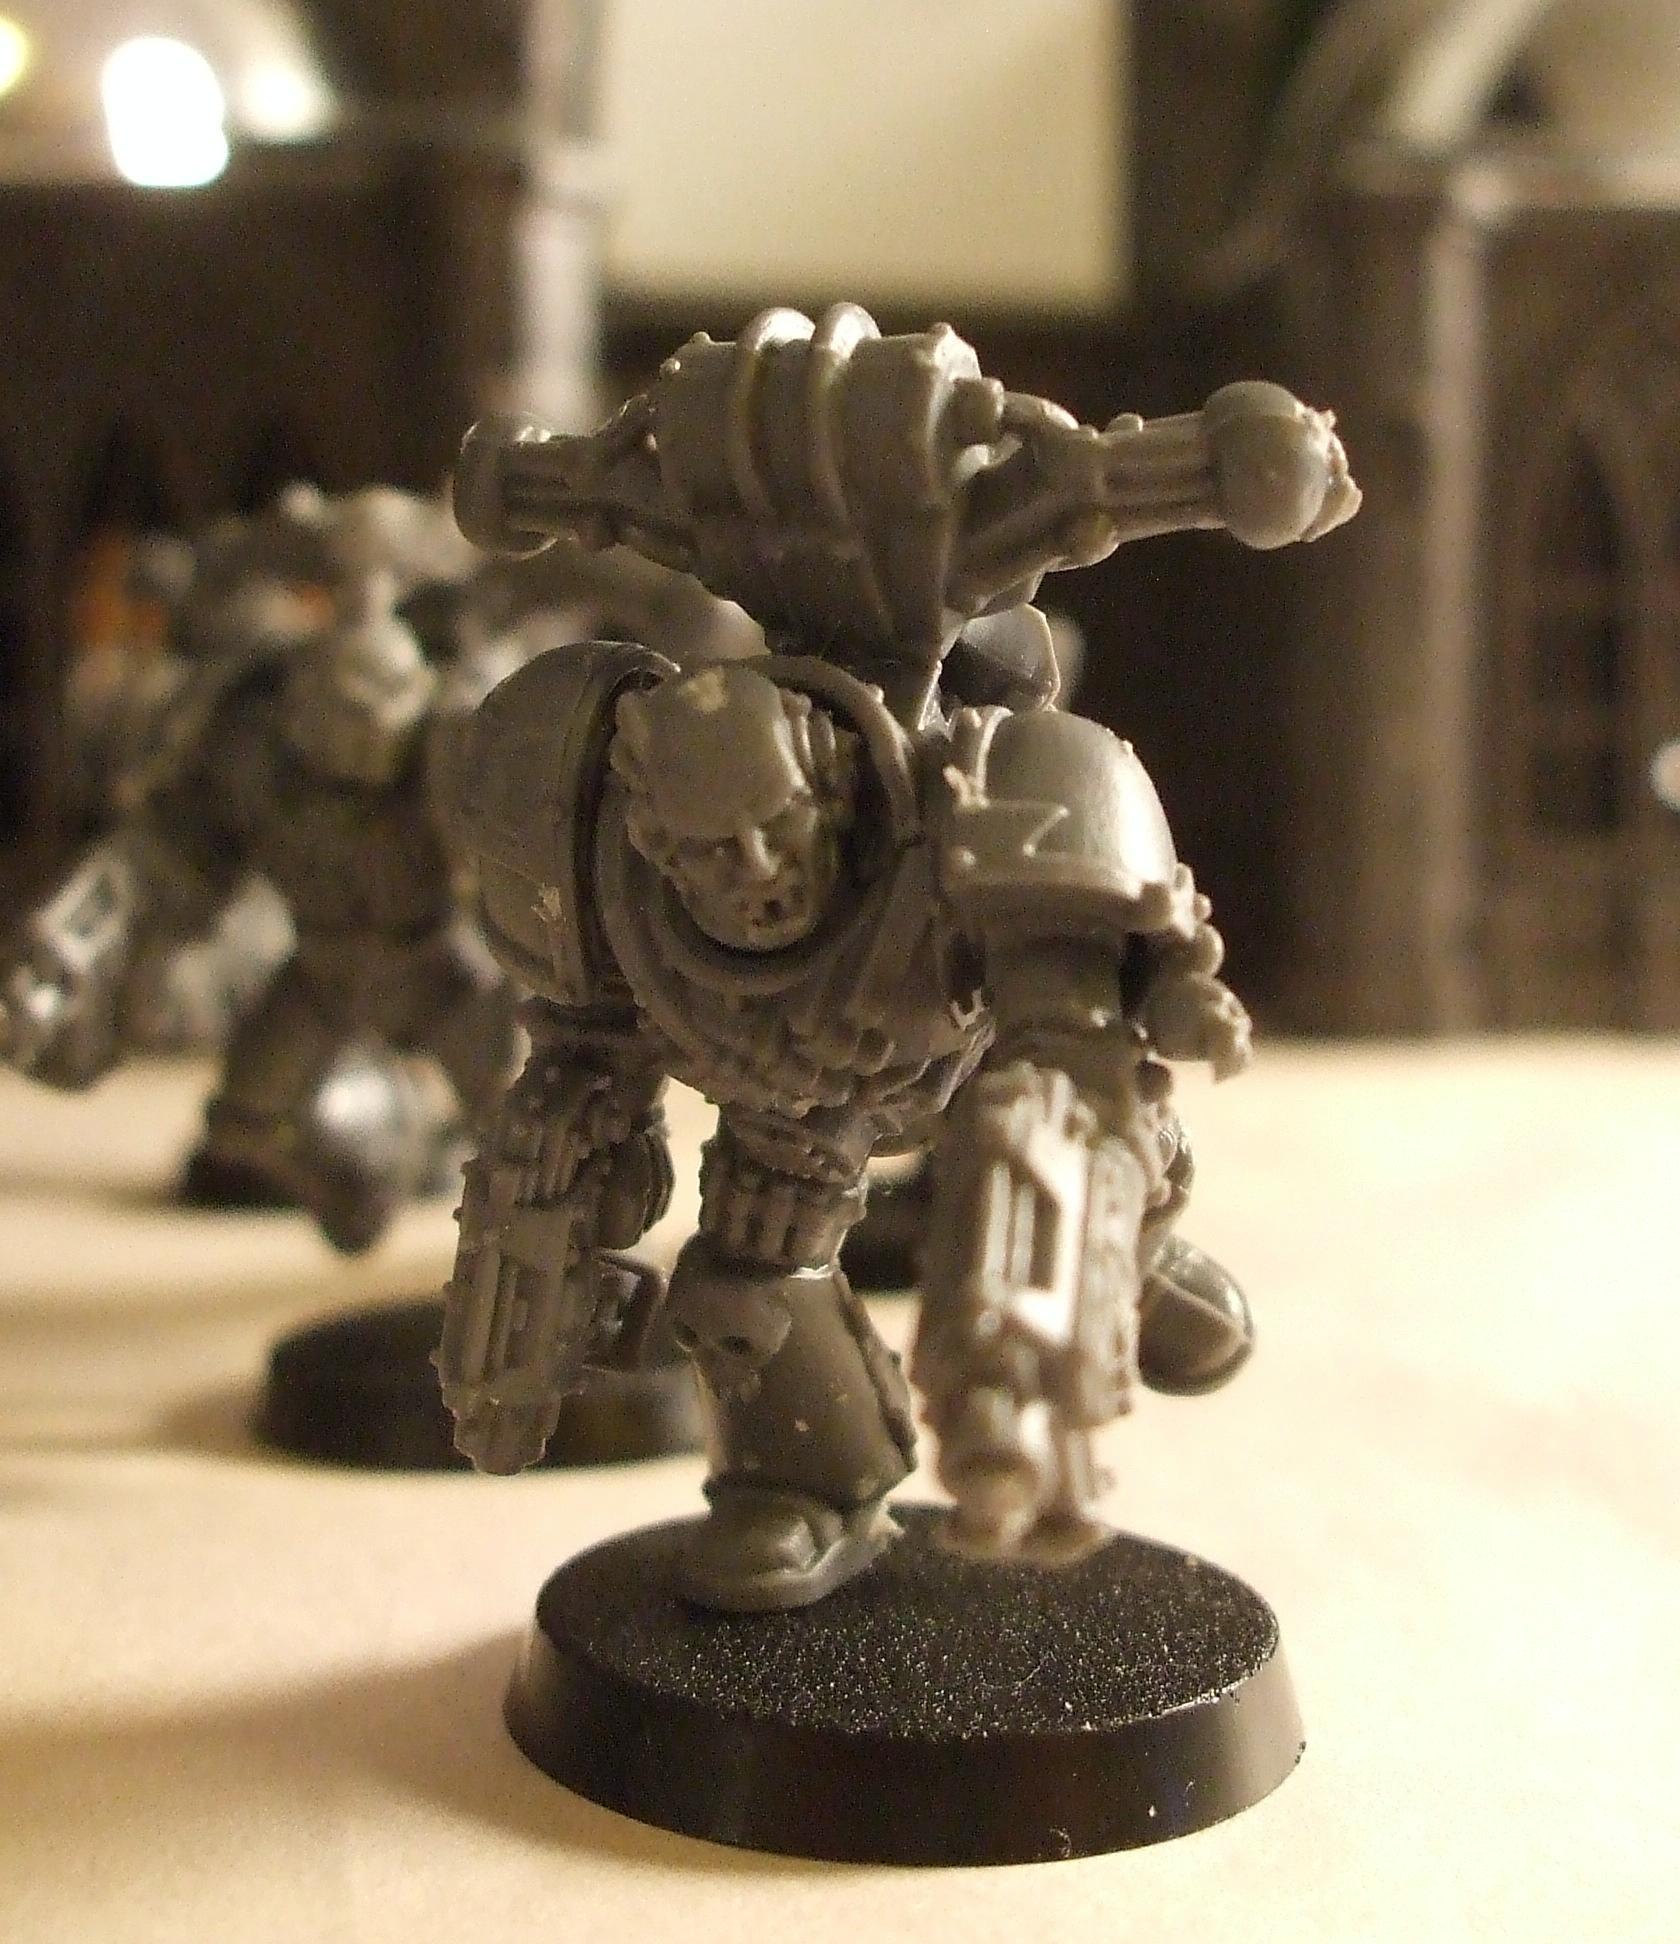 Berserkers, Chaos, Chaos Space Marines, Dual Pistol, Khorne, Running, Warhammer 40,000